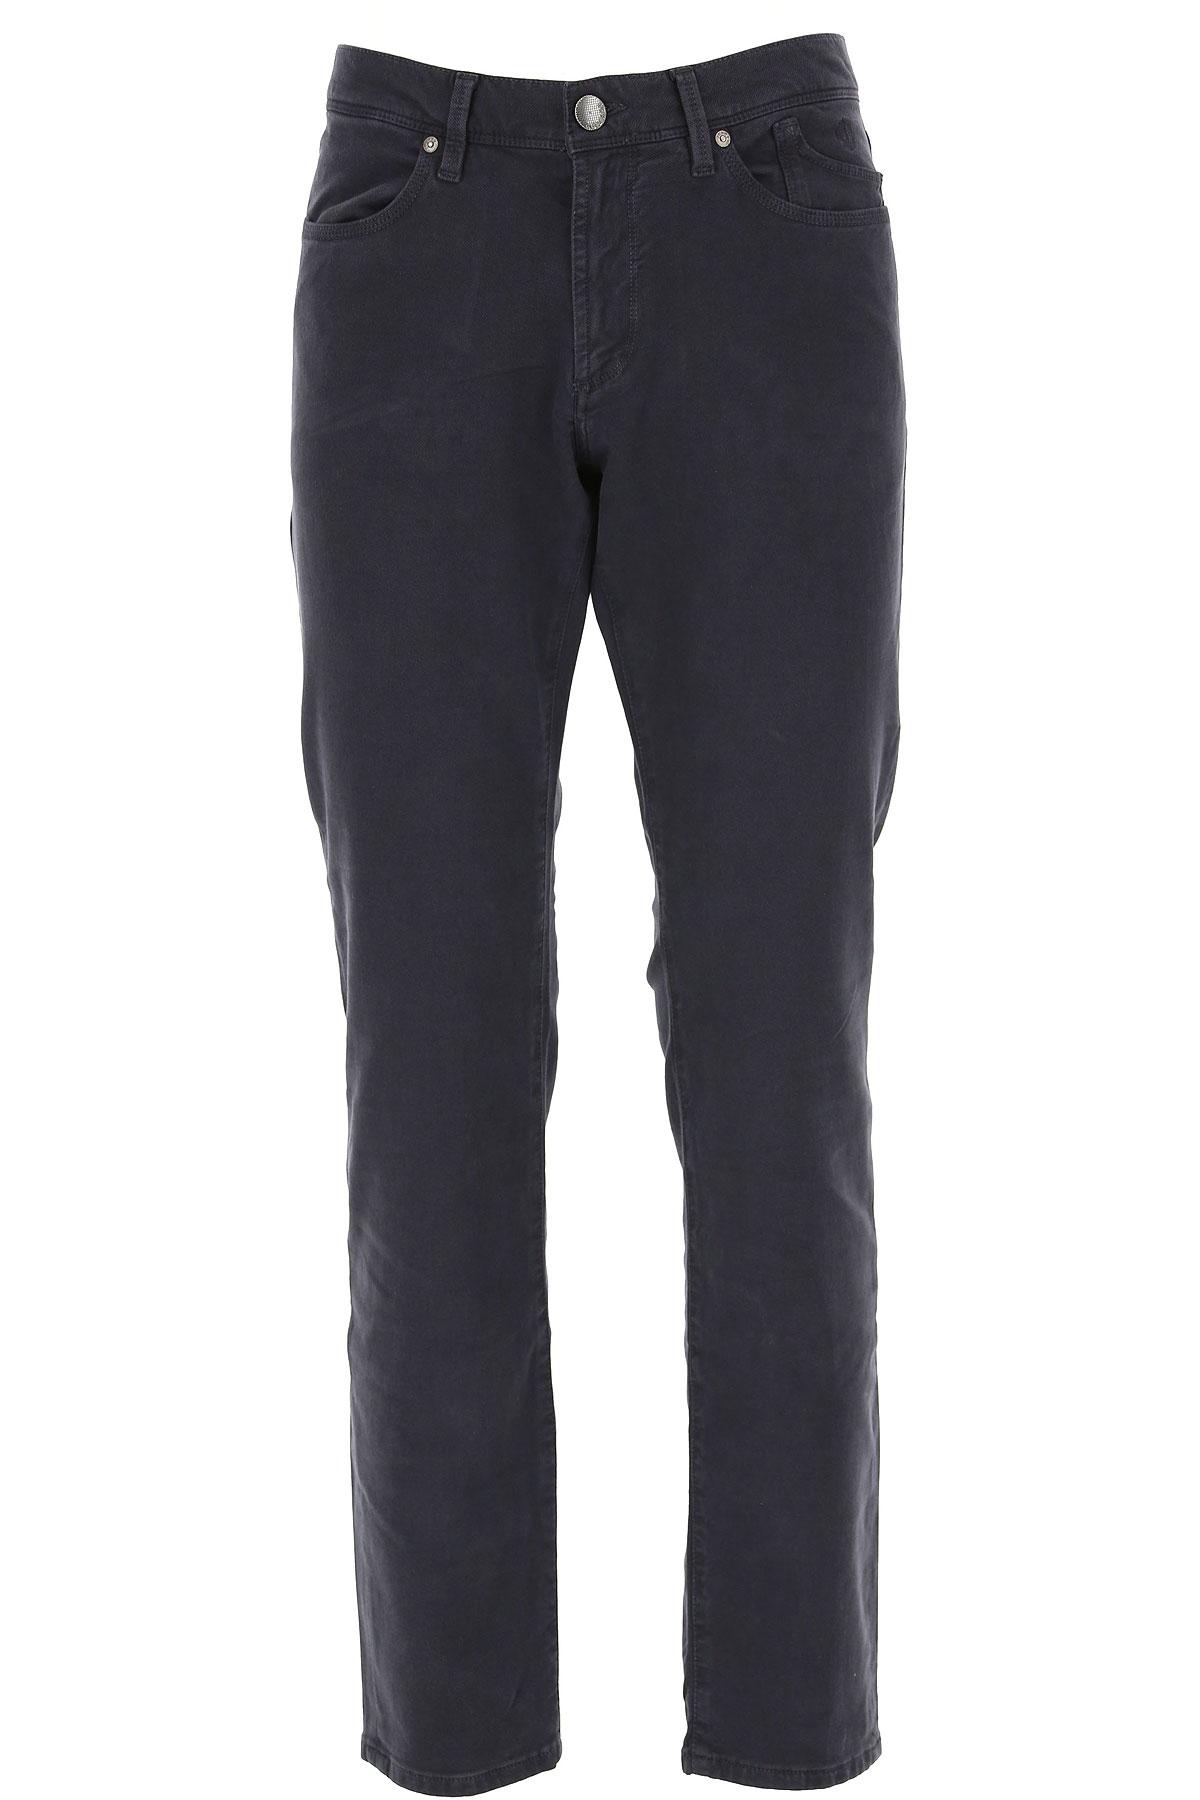 Jeckerson Pants for Men, Midnight Blue, Cotton, 2019, 30 31